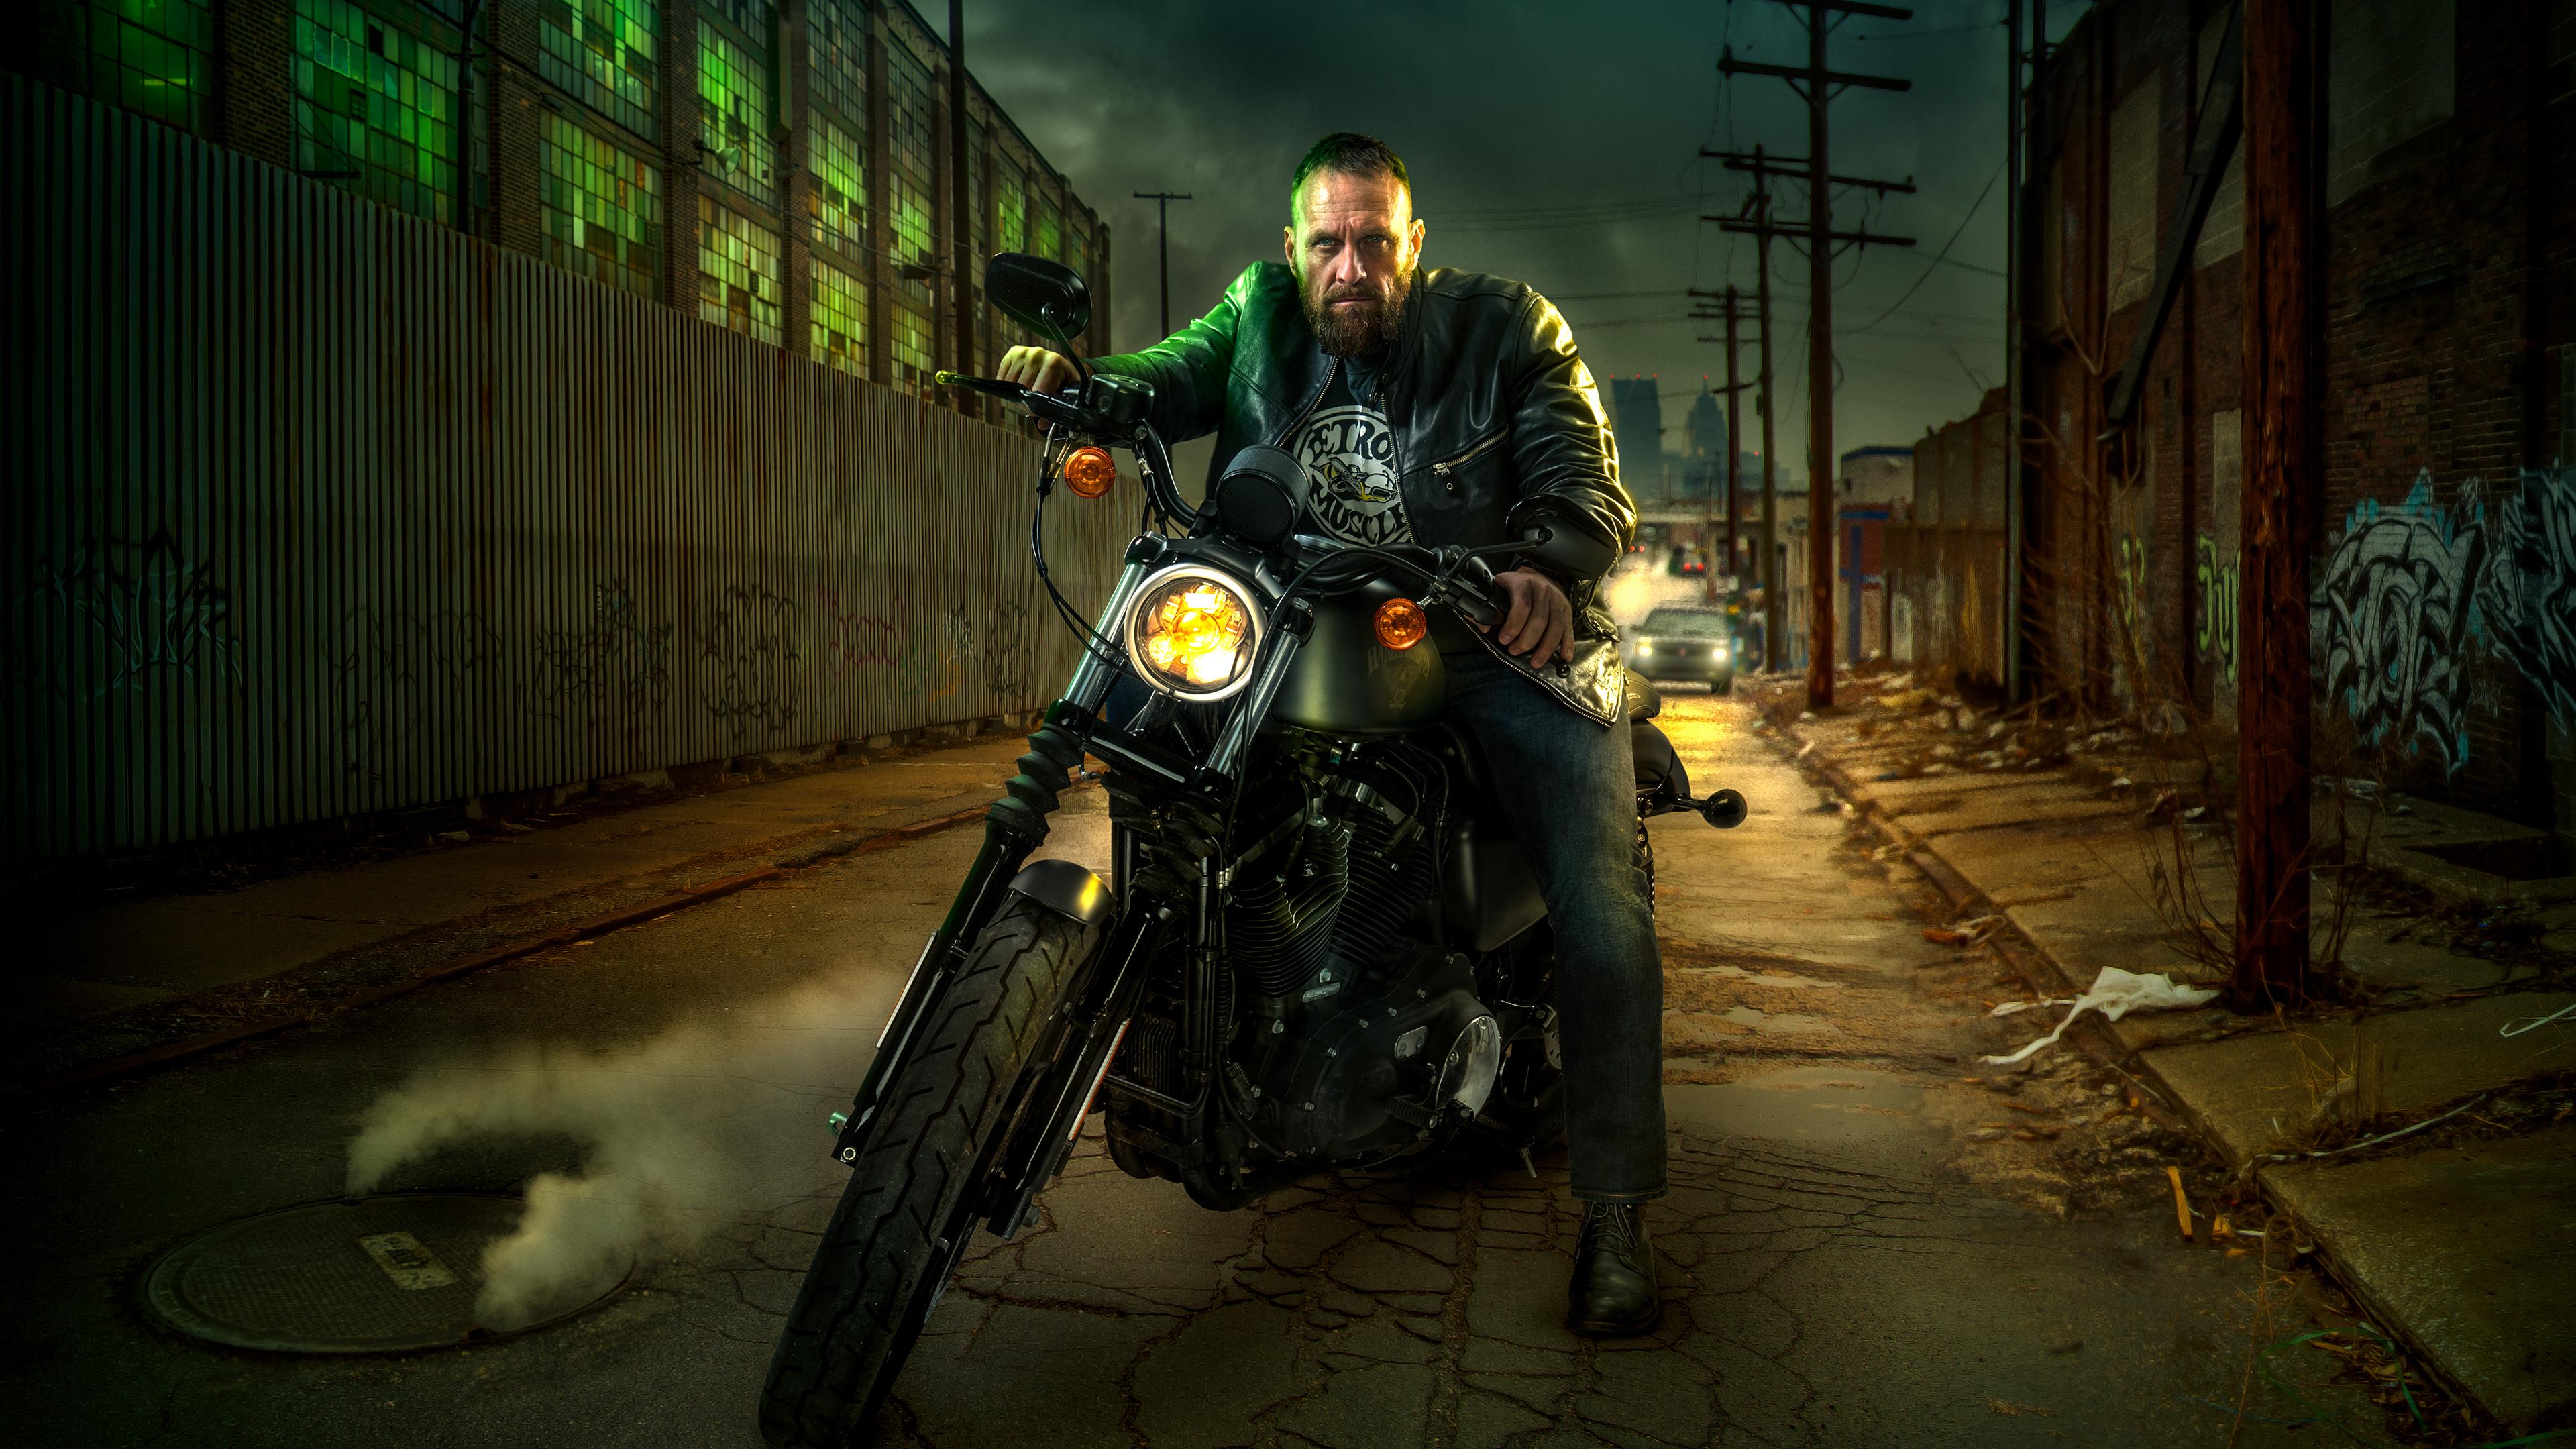 harley davidson night rider 1536316613 - Harley Davidson Night Rider - hd-wallpapers, harley davidson wallpapers, digital art wallpapers, bikes wallpapers, behance wallpapers, artwork wallpapers, artist wallpapers, 4k-wallpapers